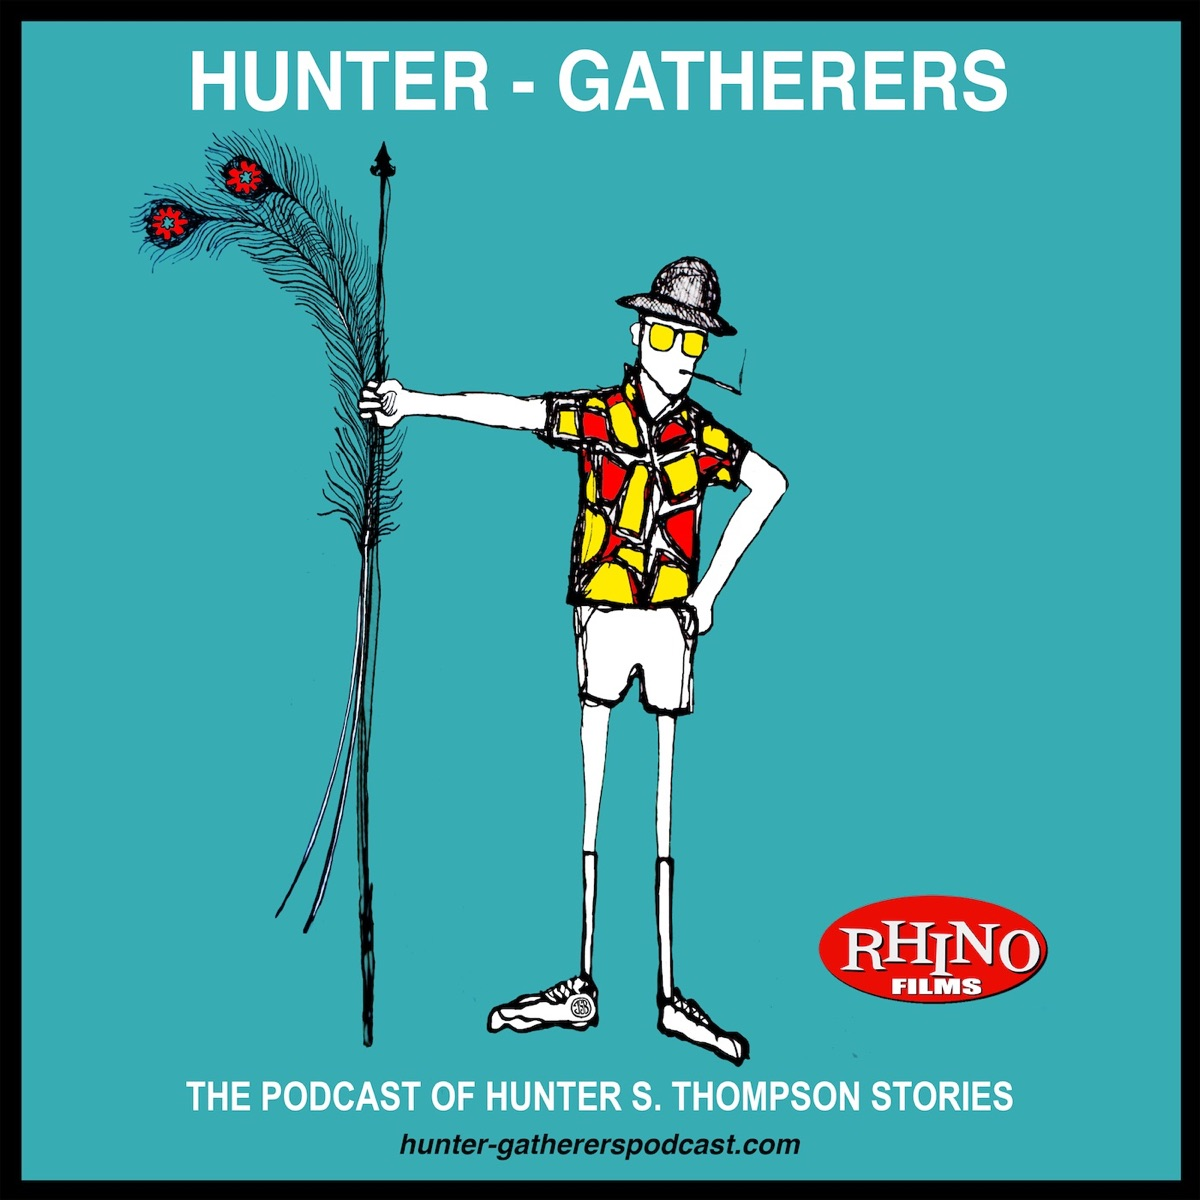 Hunter-Gatherers Podcast